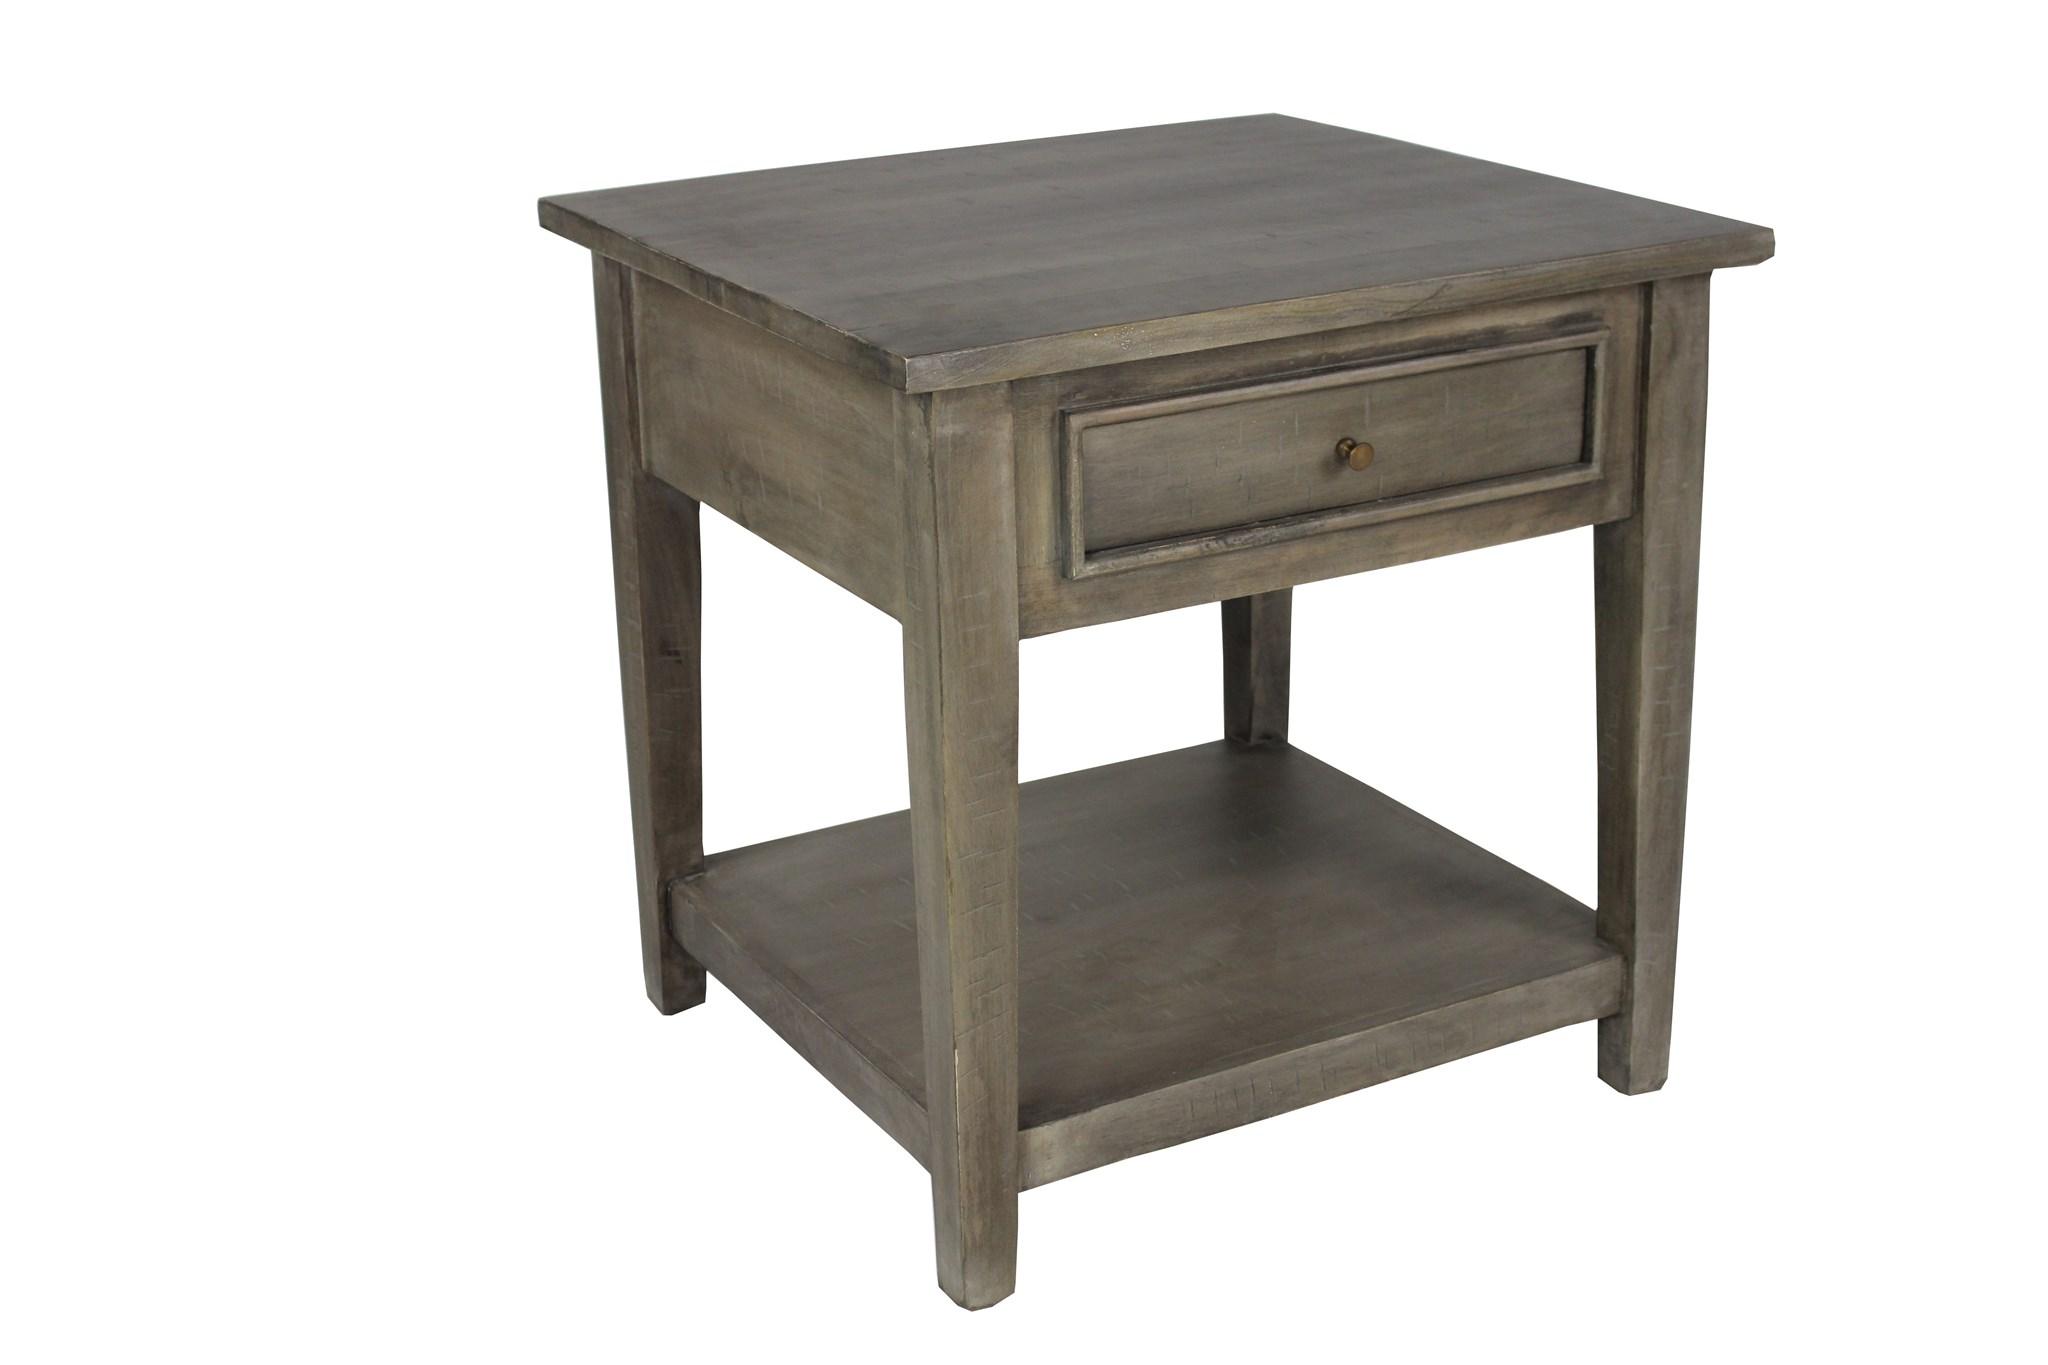 Mistral End Table 28x26x28 SAL